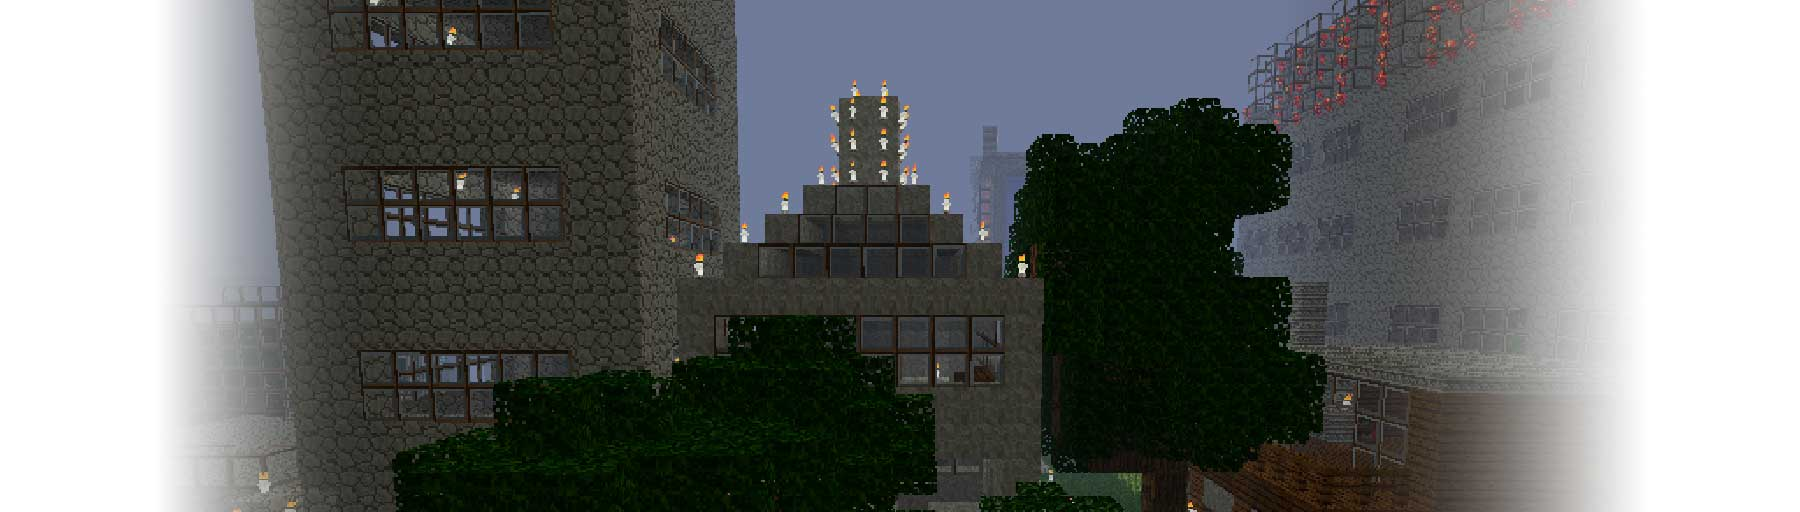 Minecraft Louisville feature image